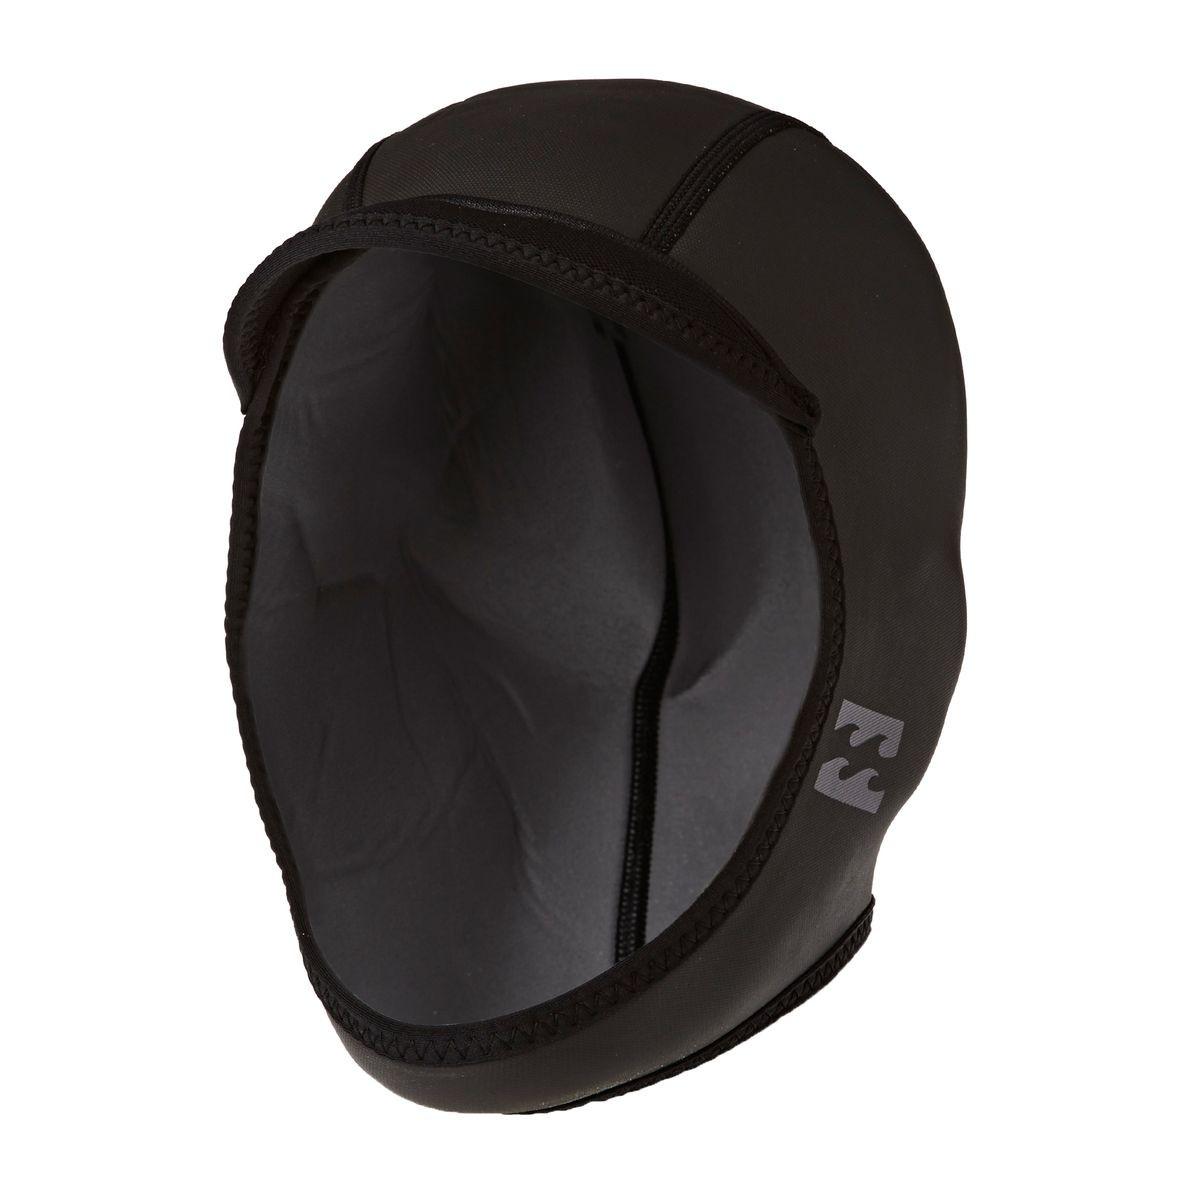 Billabong Furnace Comp 2mm 2018 Wetsuit Hood - Black